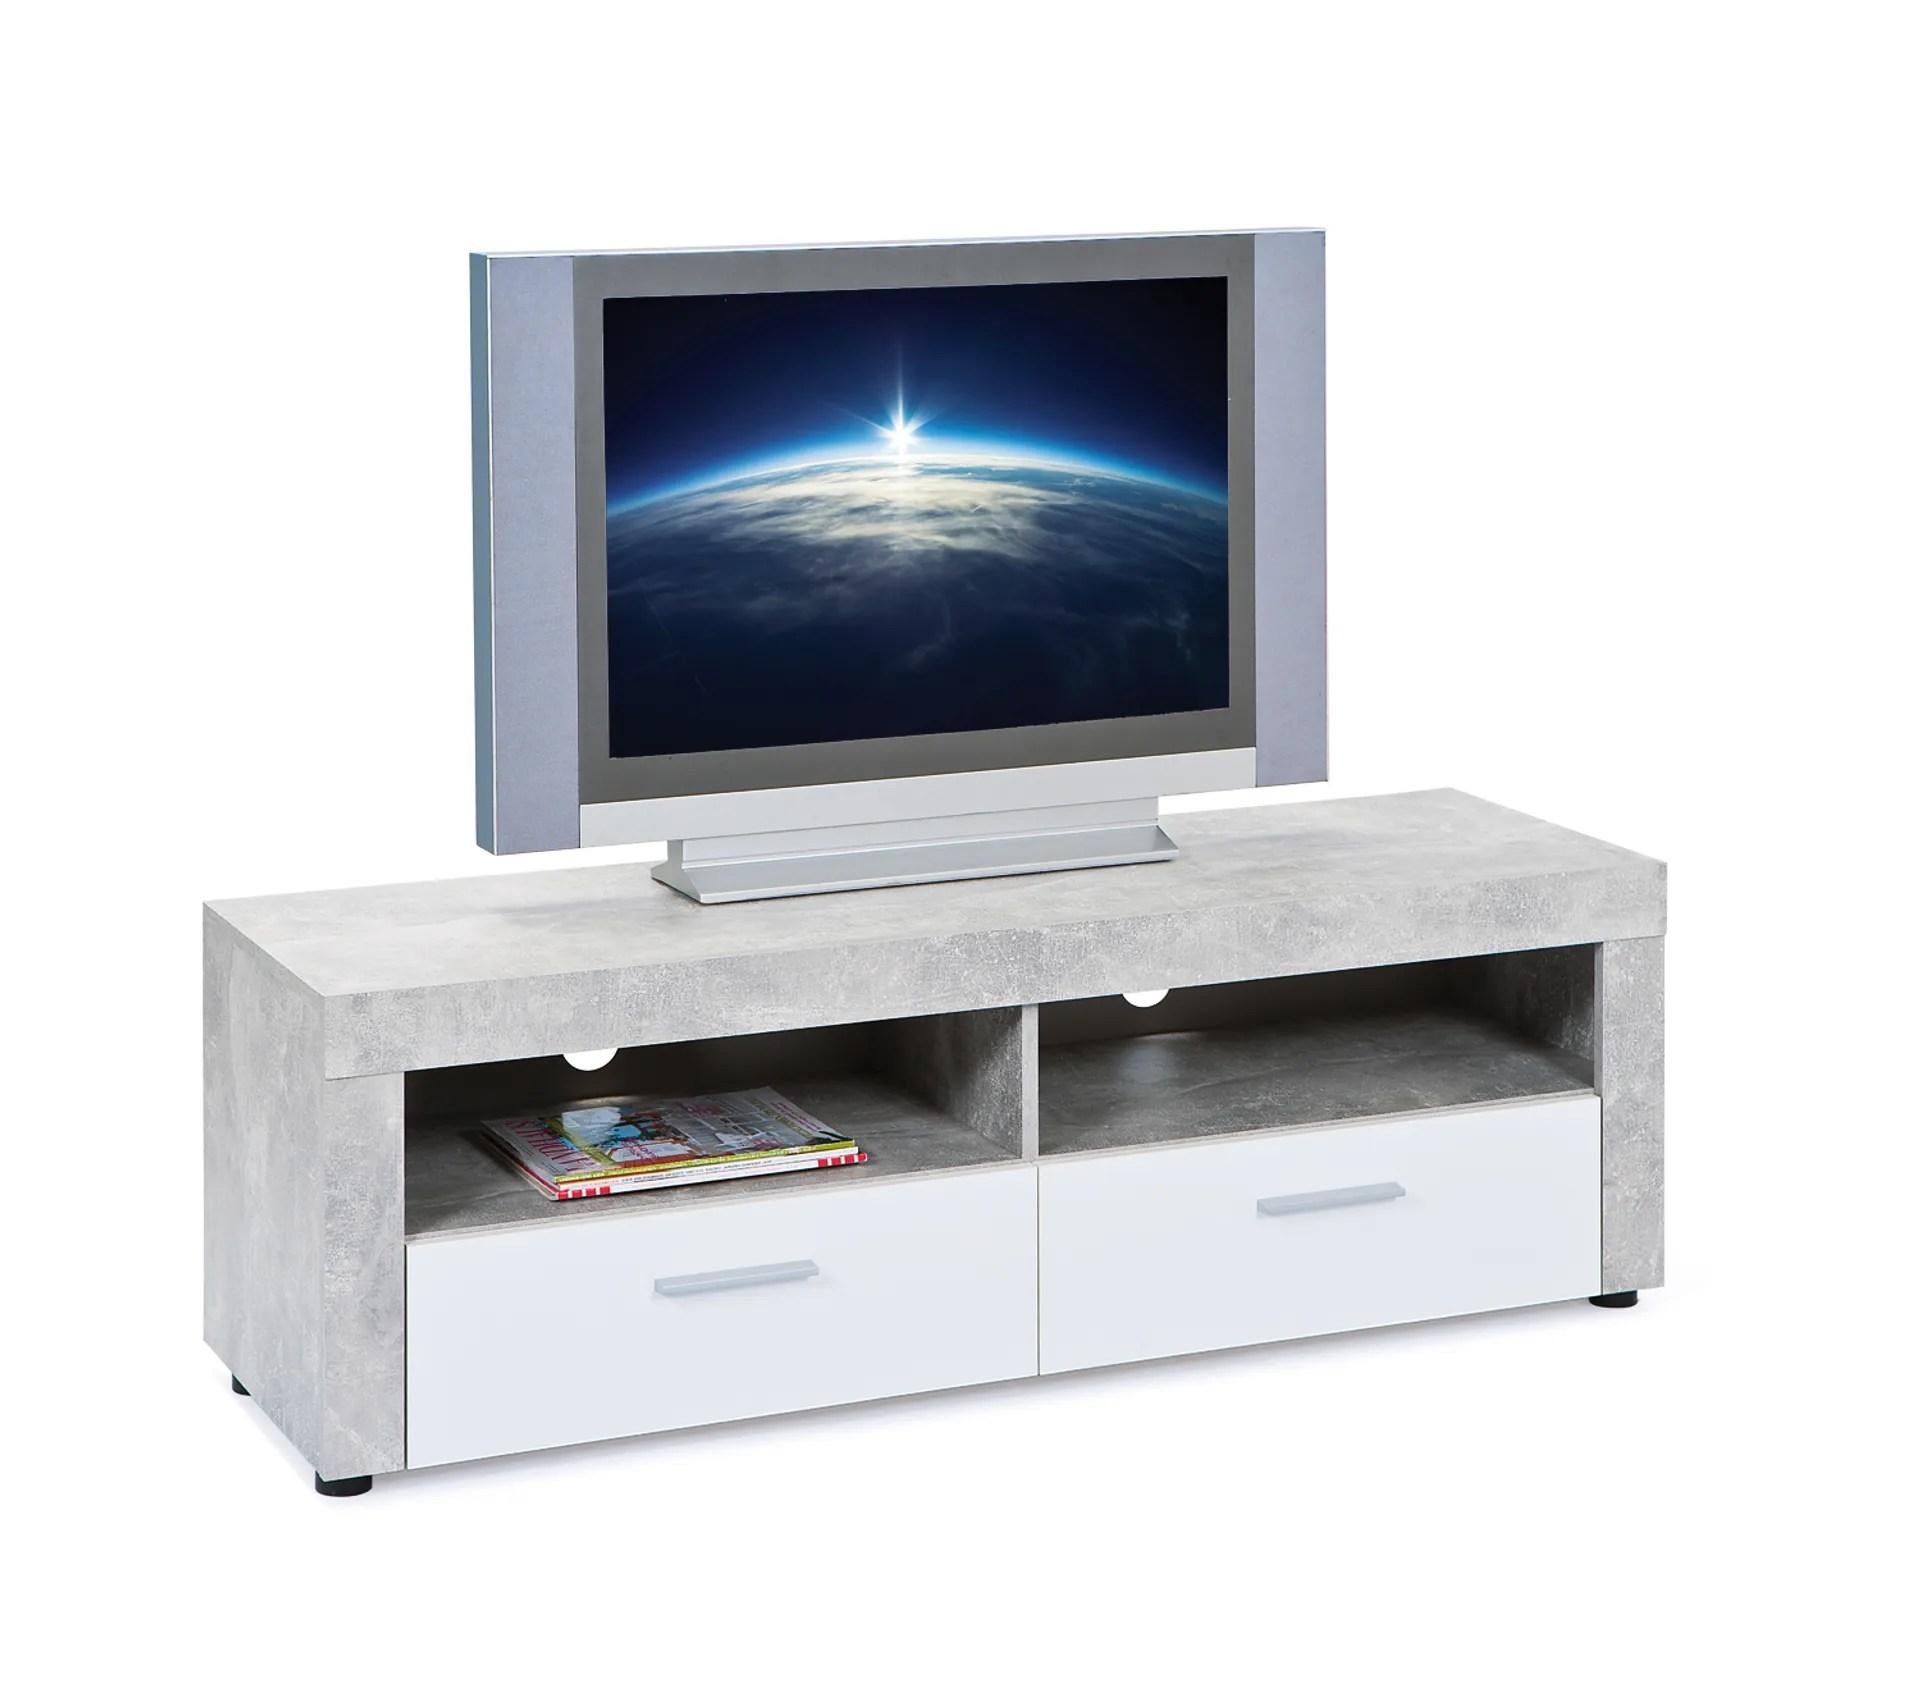 meuble tv beton avec 2 tiroirs bicolore decor beton et blanc